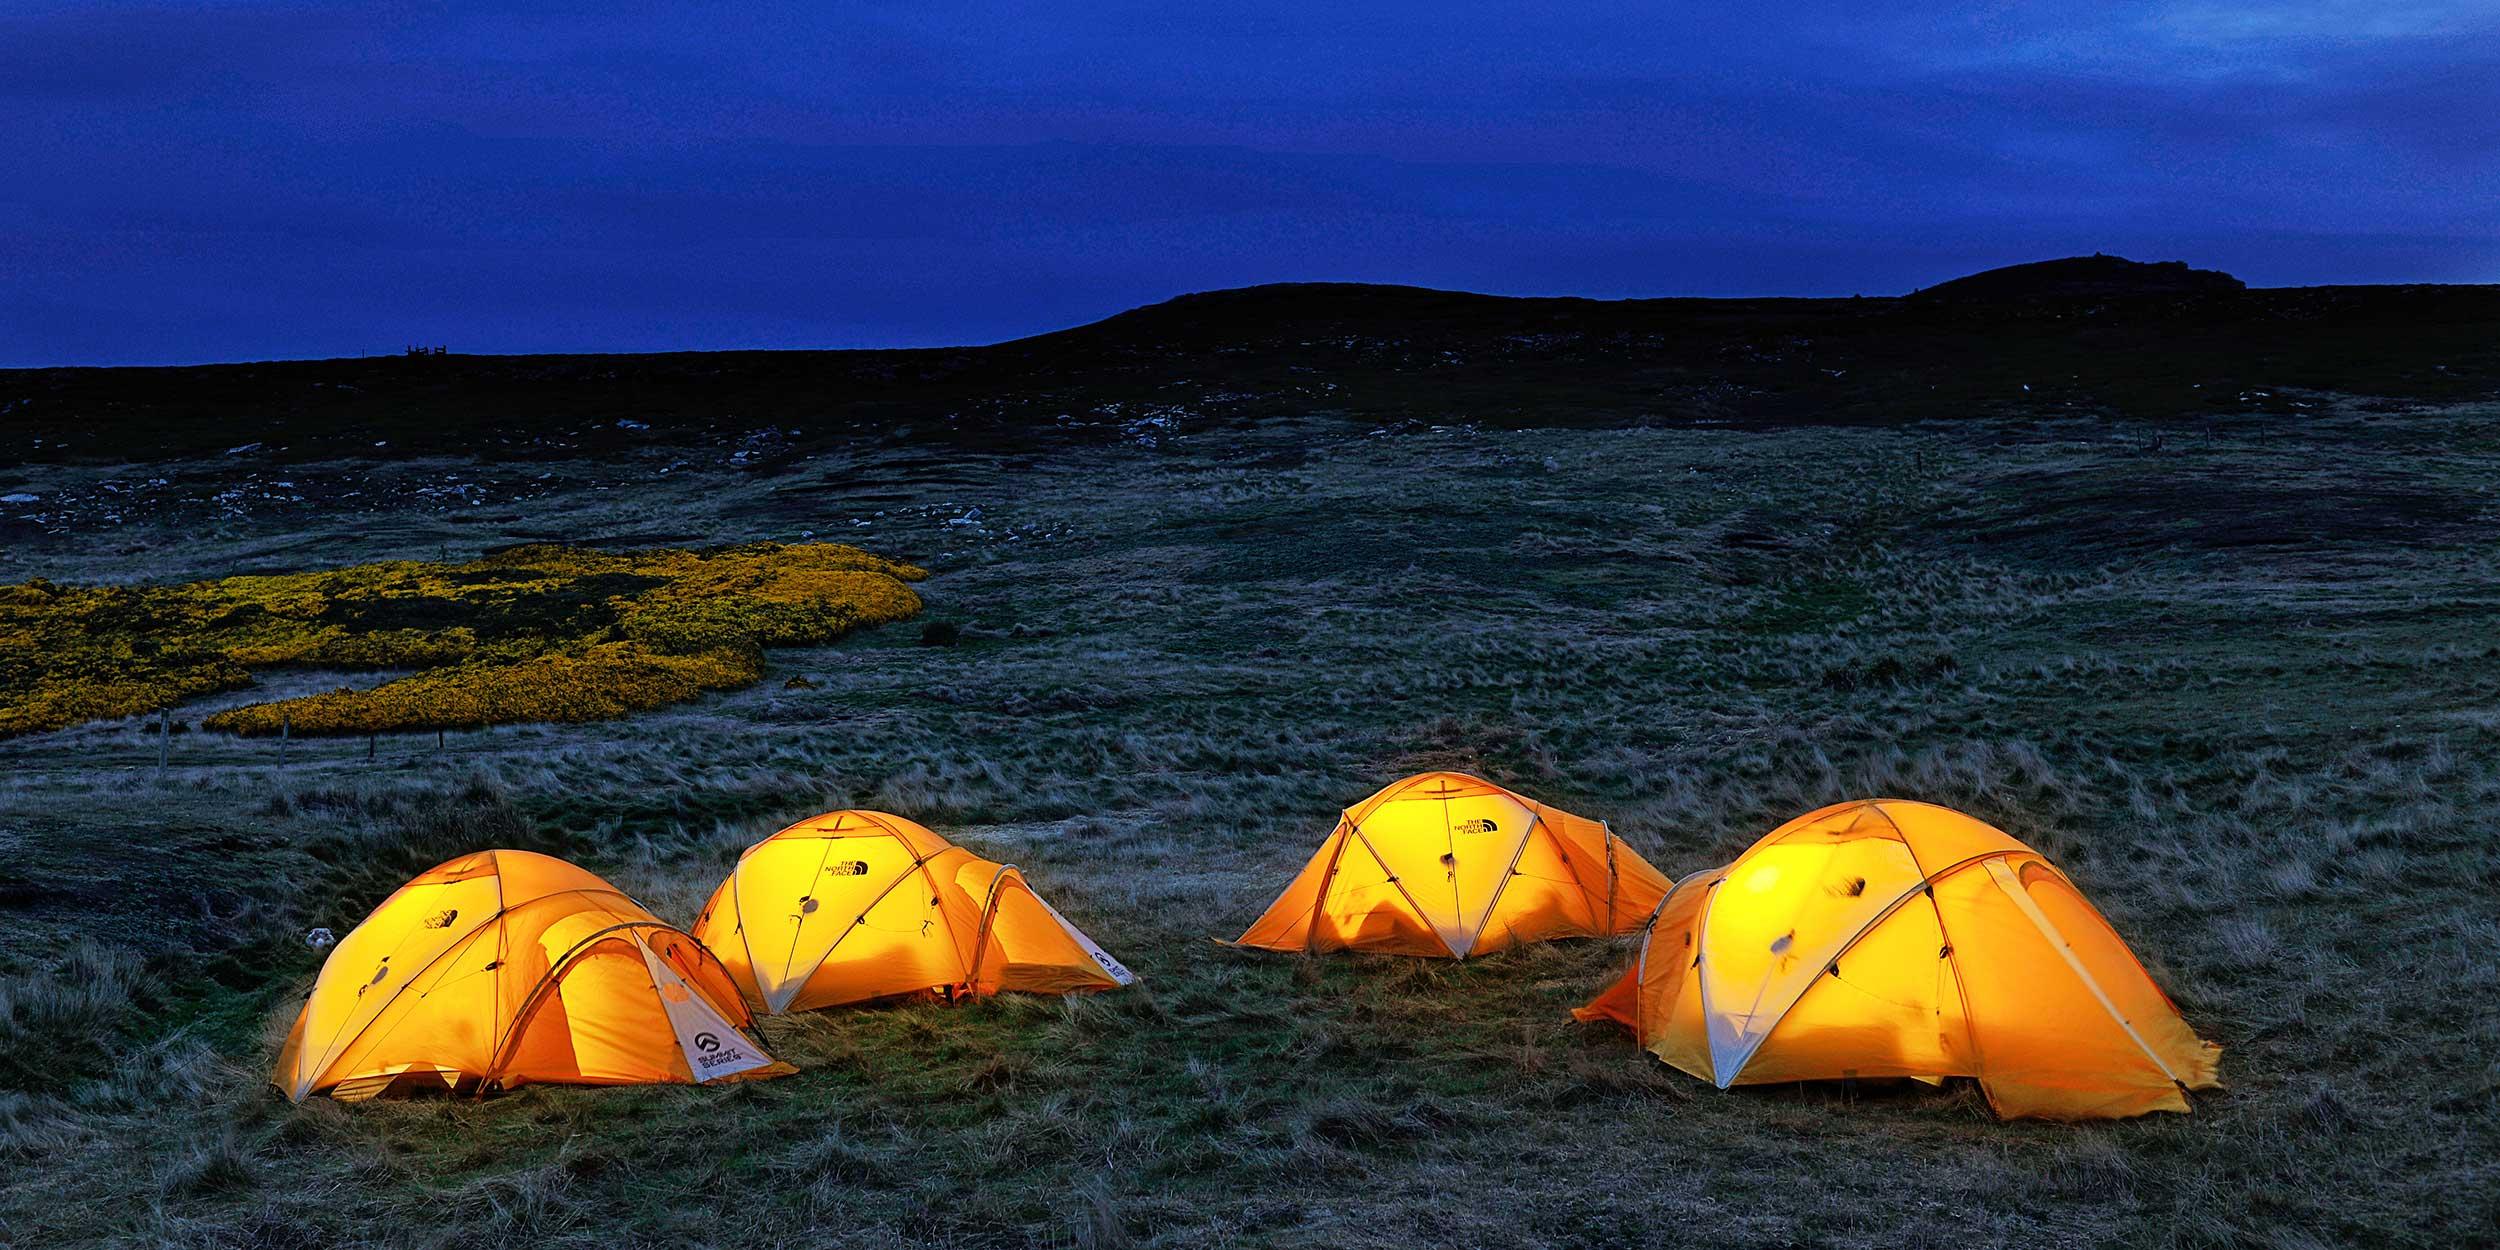 C&ing on Falkland Islands & Antarctica Excursions - Falkland Islands | Hurtigruten UK | Hurtigruten